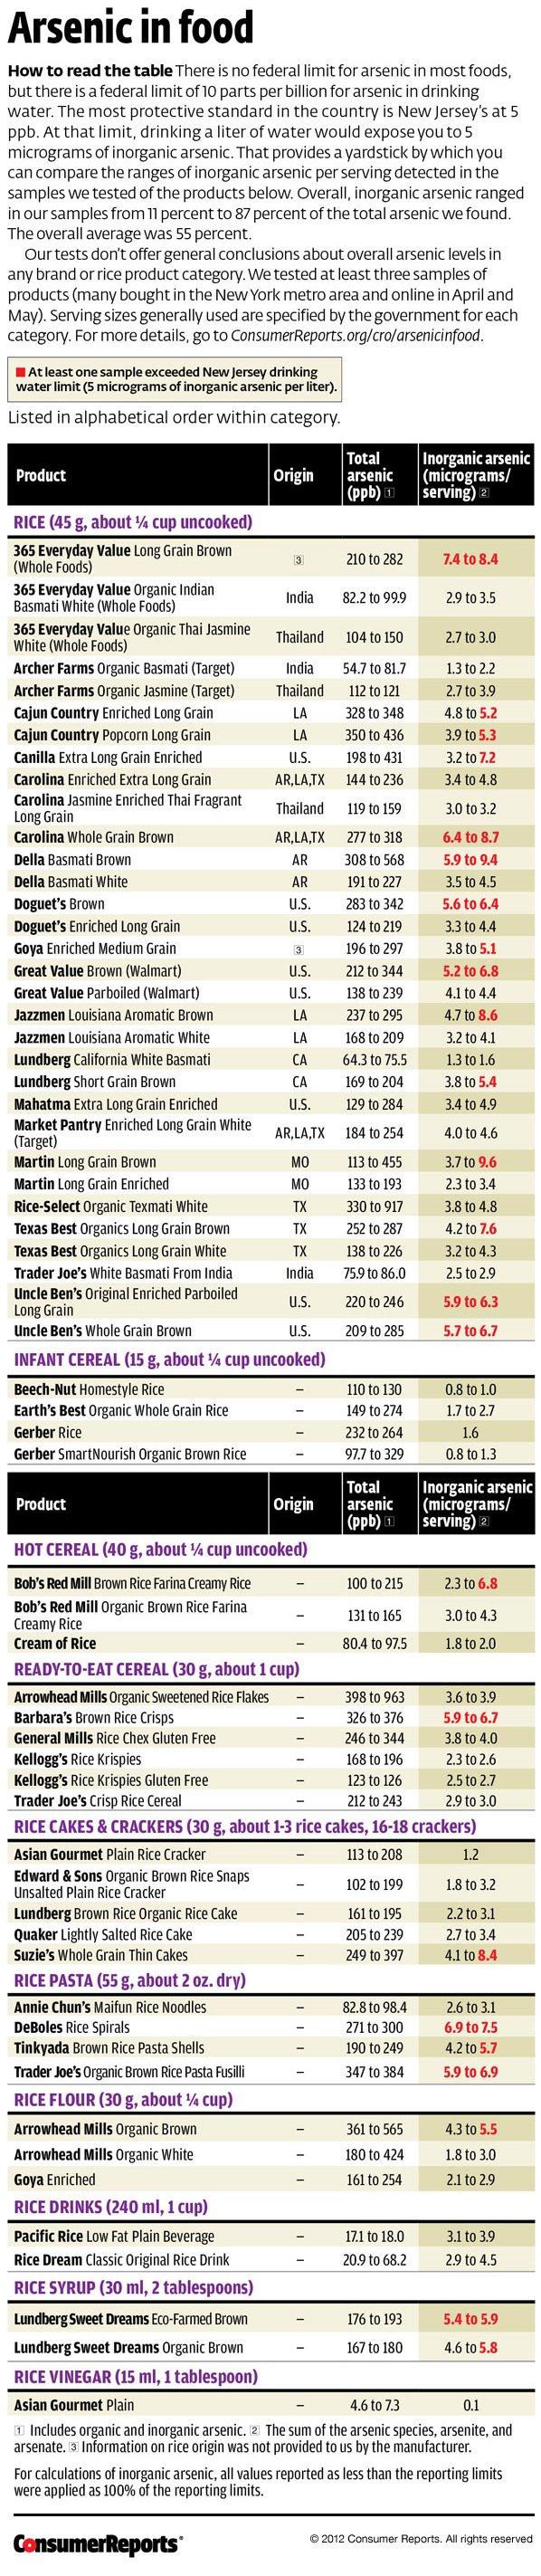 rice_Consumer_Reports_Arsenic